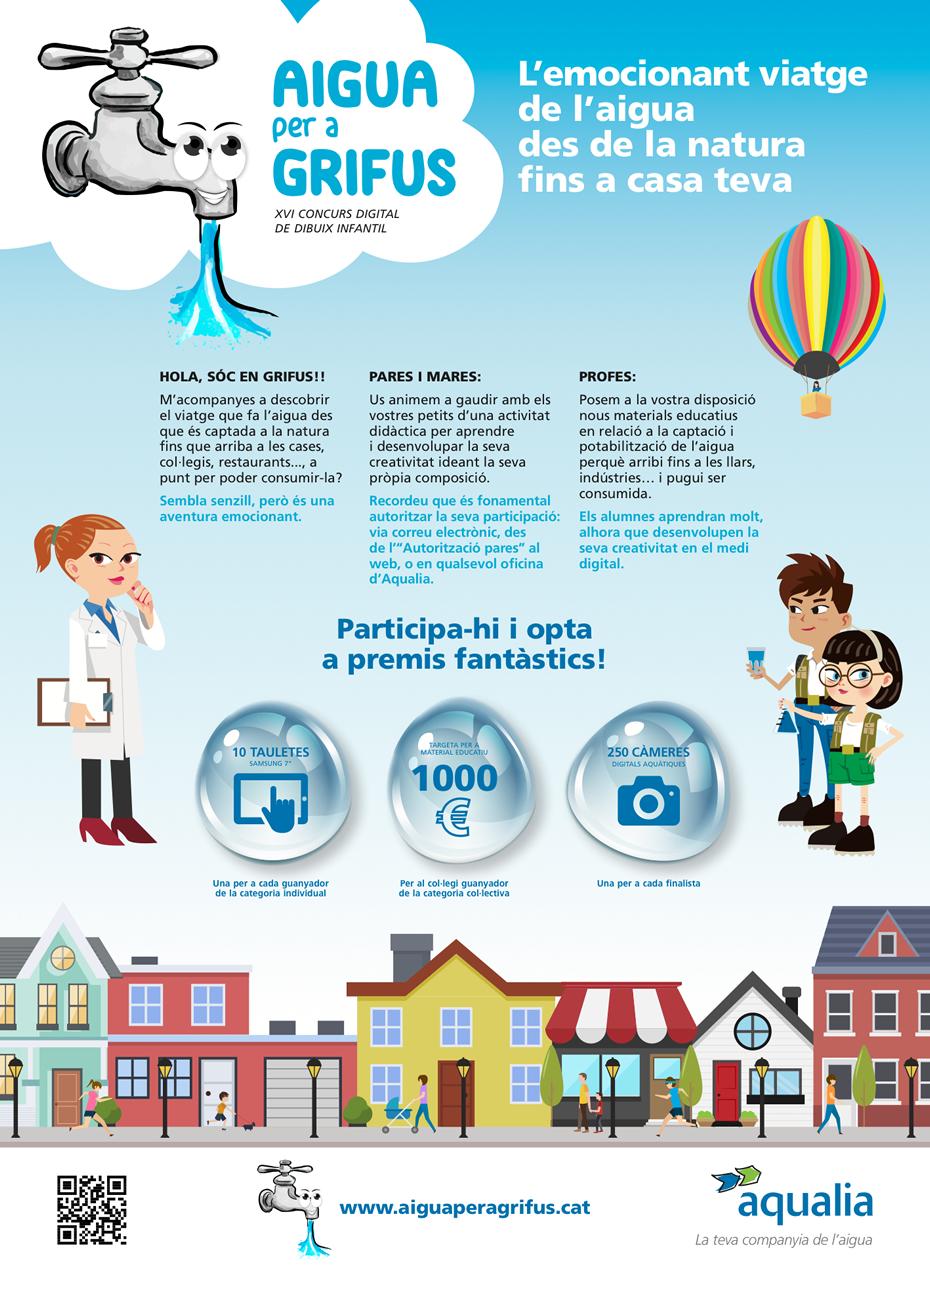 poster_aqualia.jpg - 890.55 KB